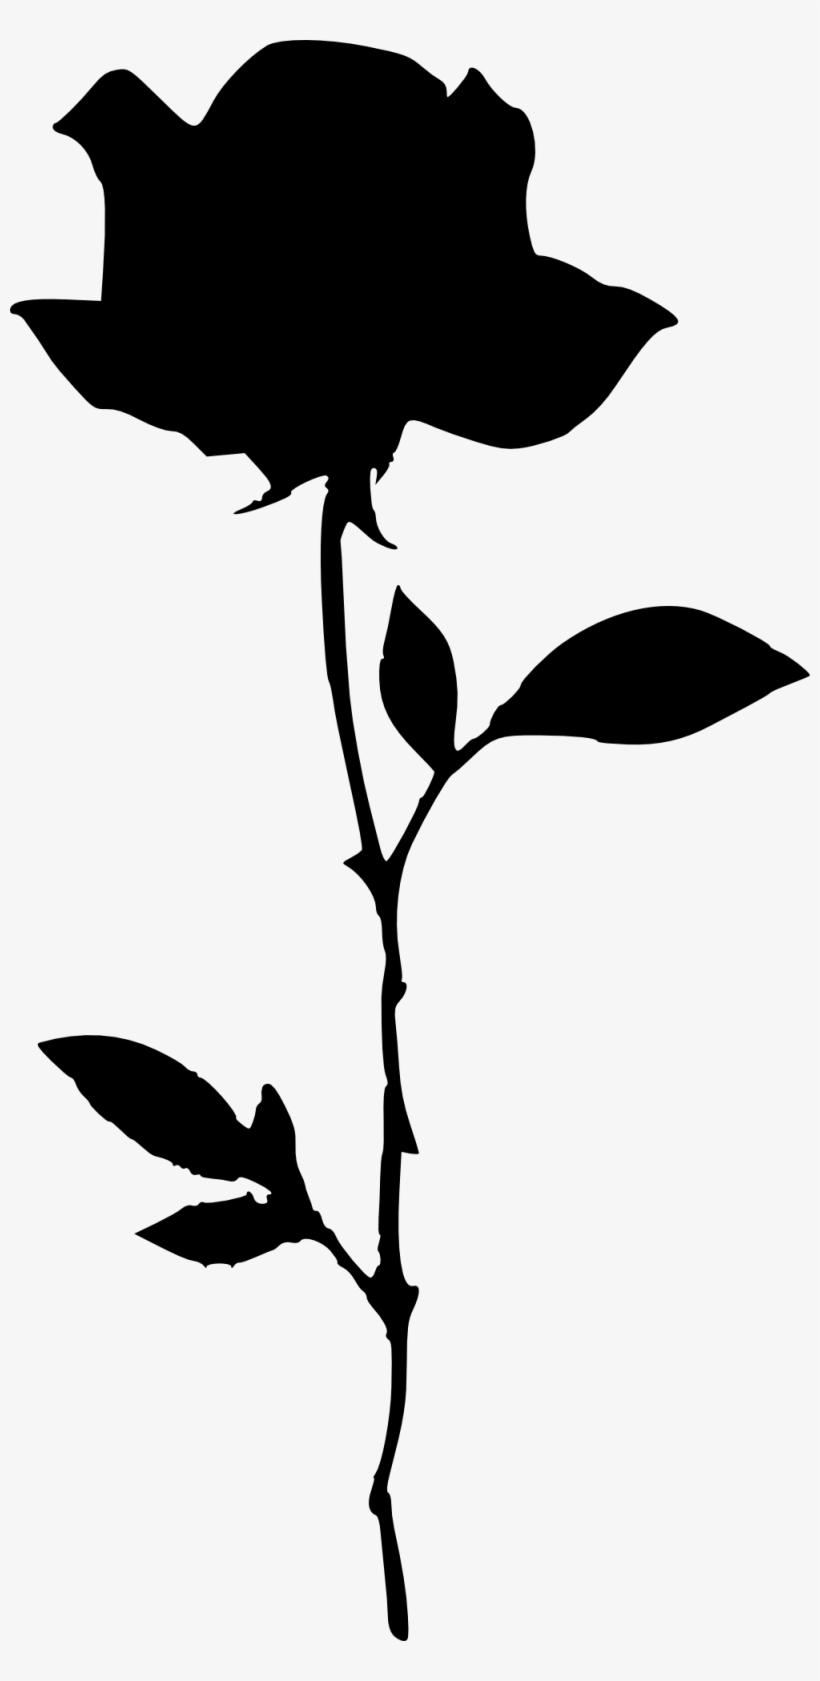 Png File Size - Flower Silhouette Transparent Background, transparent png #31909